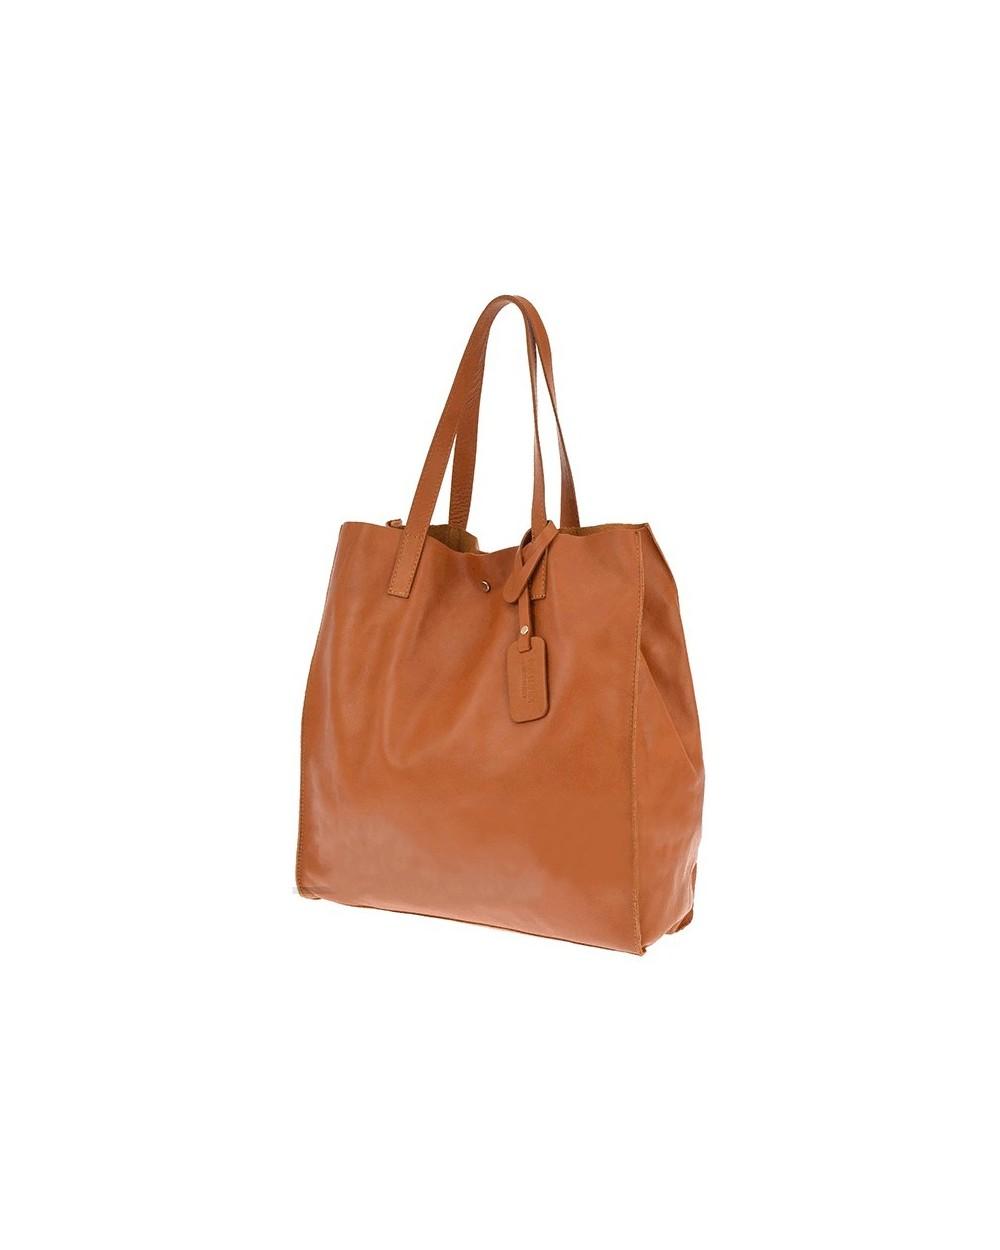 da960d143c385 Włoska torebka skórzana vera pelle worek shopper Złota metaliczna. ‹ ›